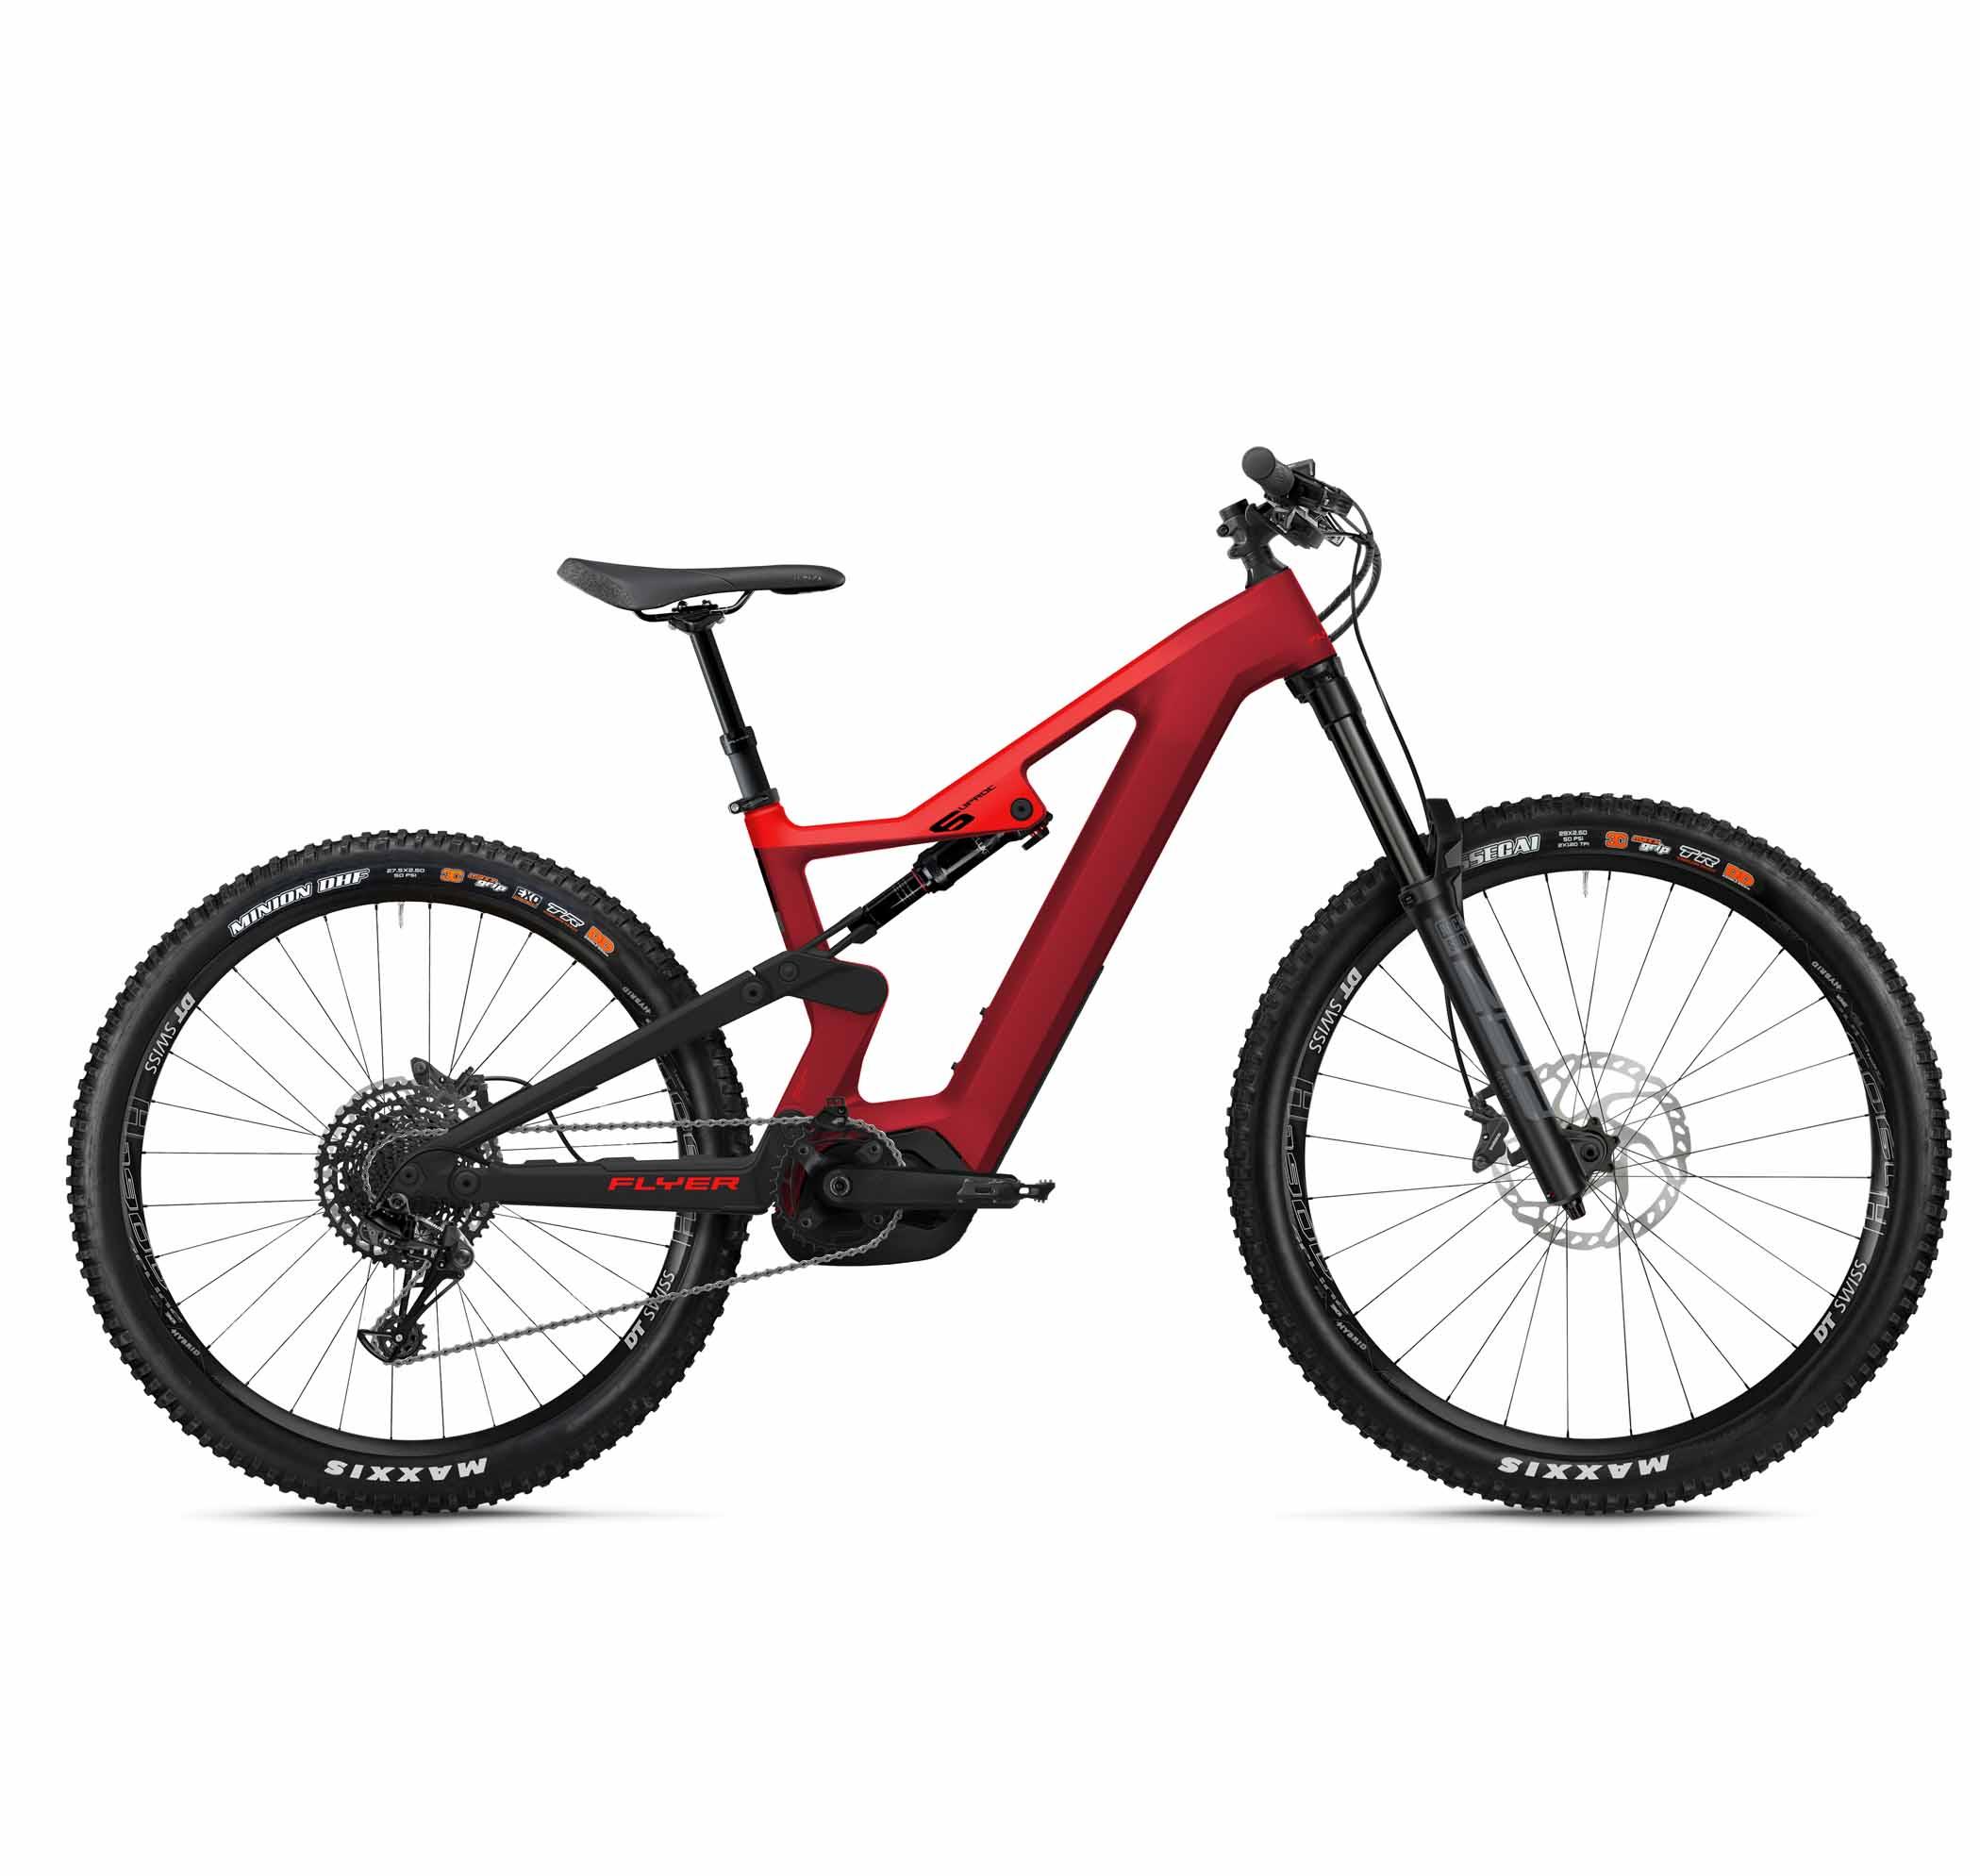 Flyer_Rodeo_Bike_eBike_Uproc_6_650_fullsuspension_pulse_red_mars_red_satin